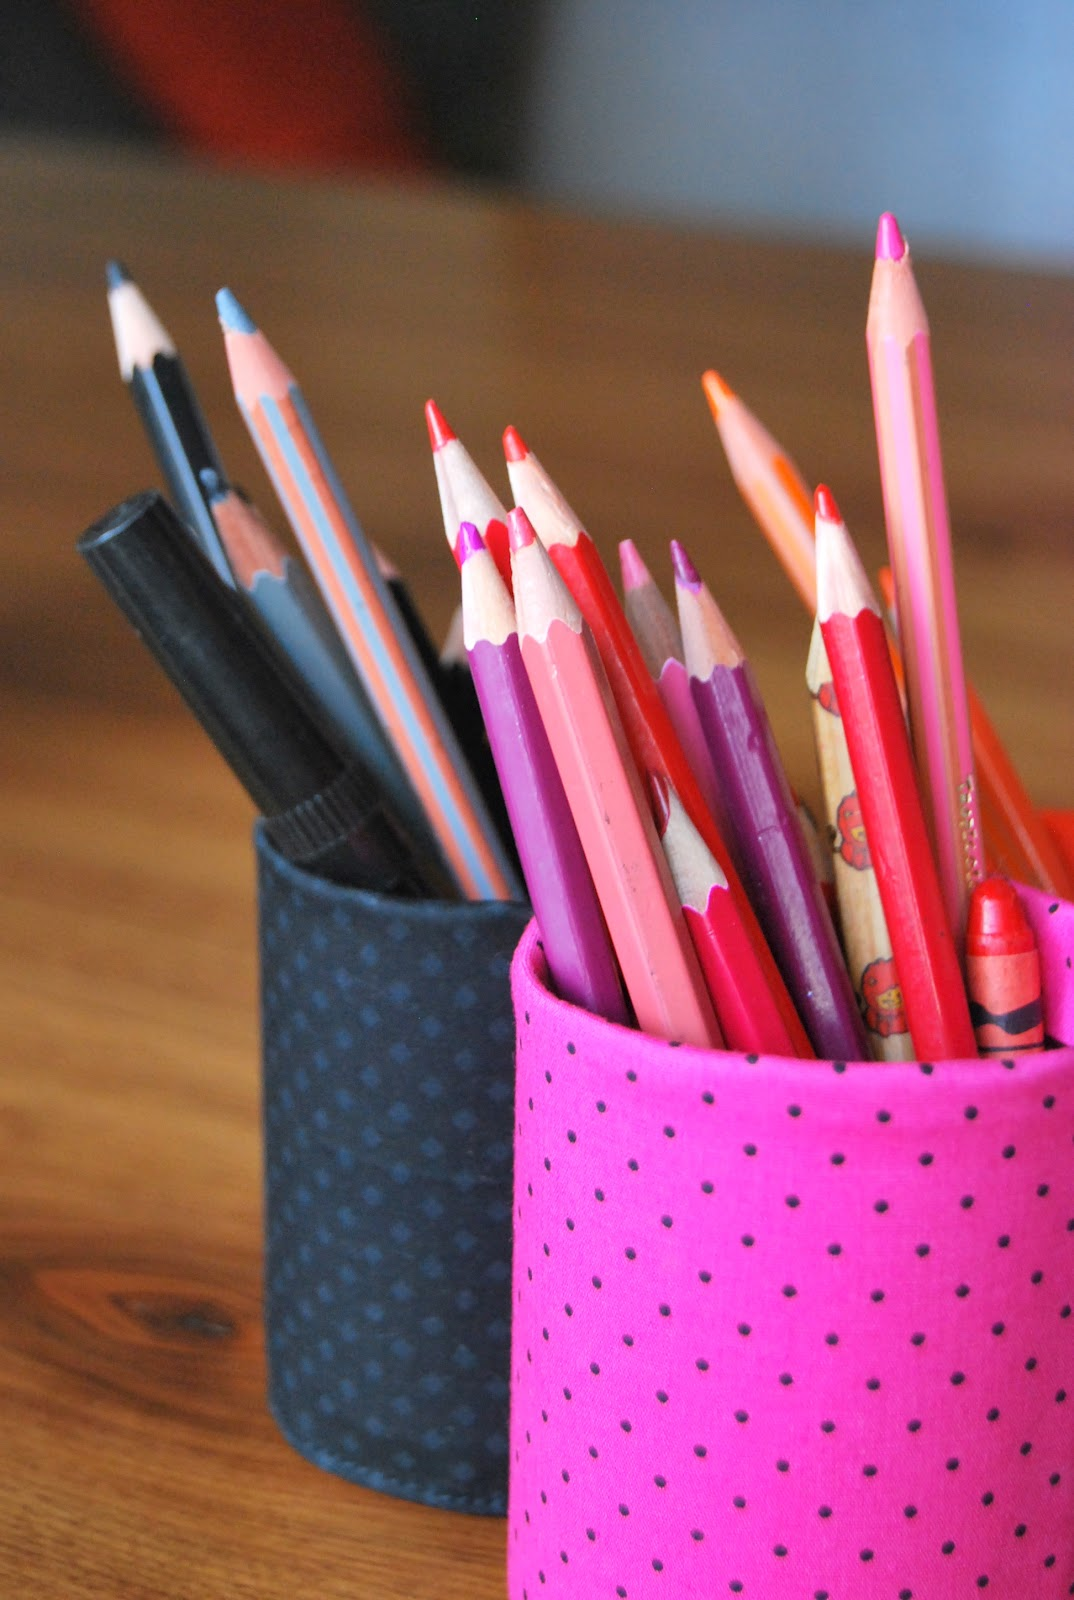 Le grand bazaar le cauchemar du crayon de couleur trop - Bricolage pot a crayon facile ...